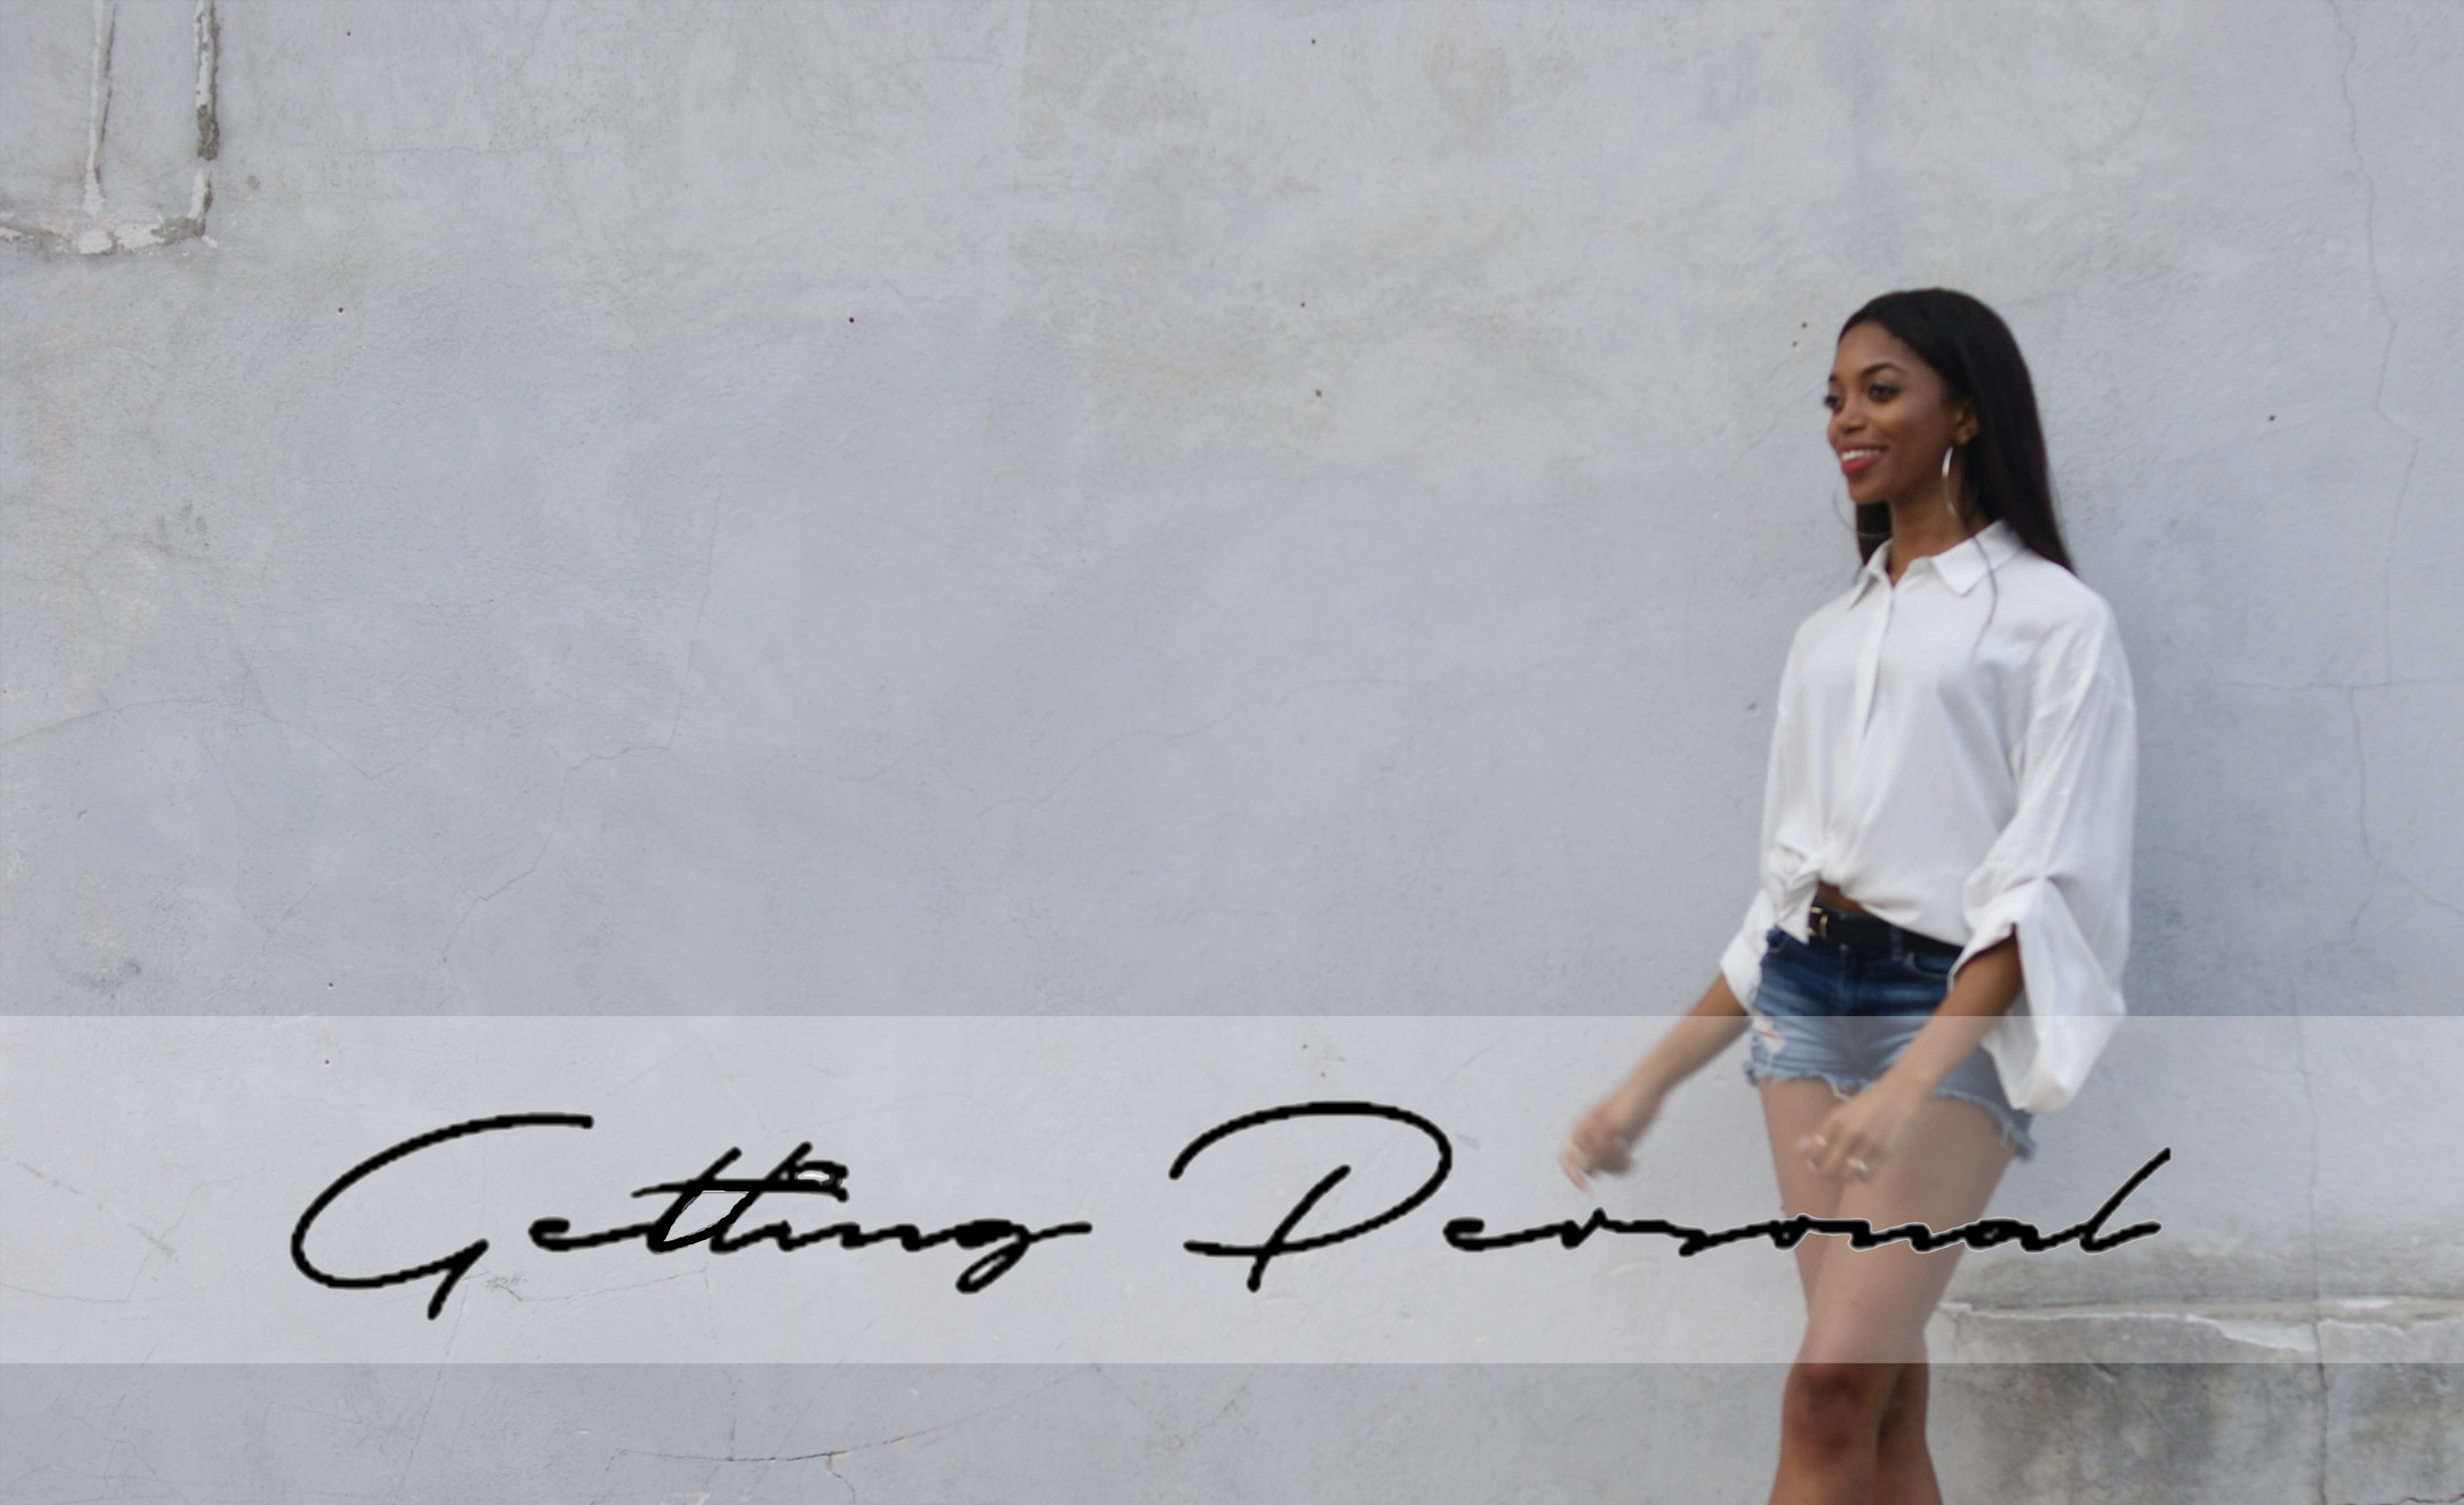 TAYJERS | Getting Personal